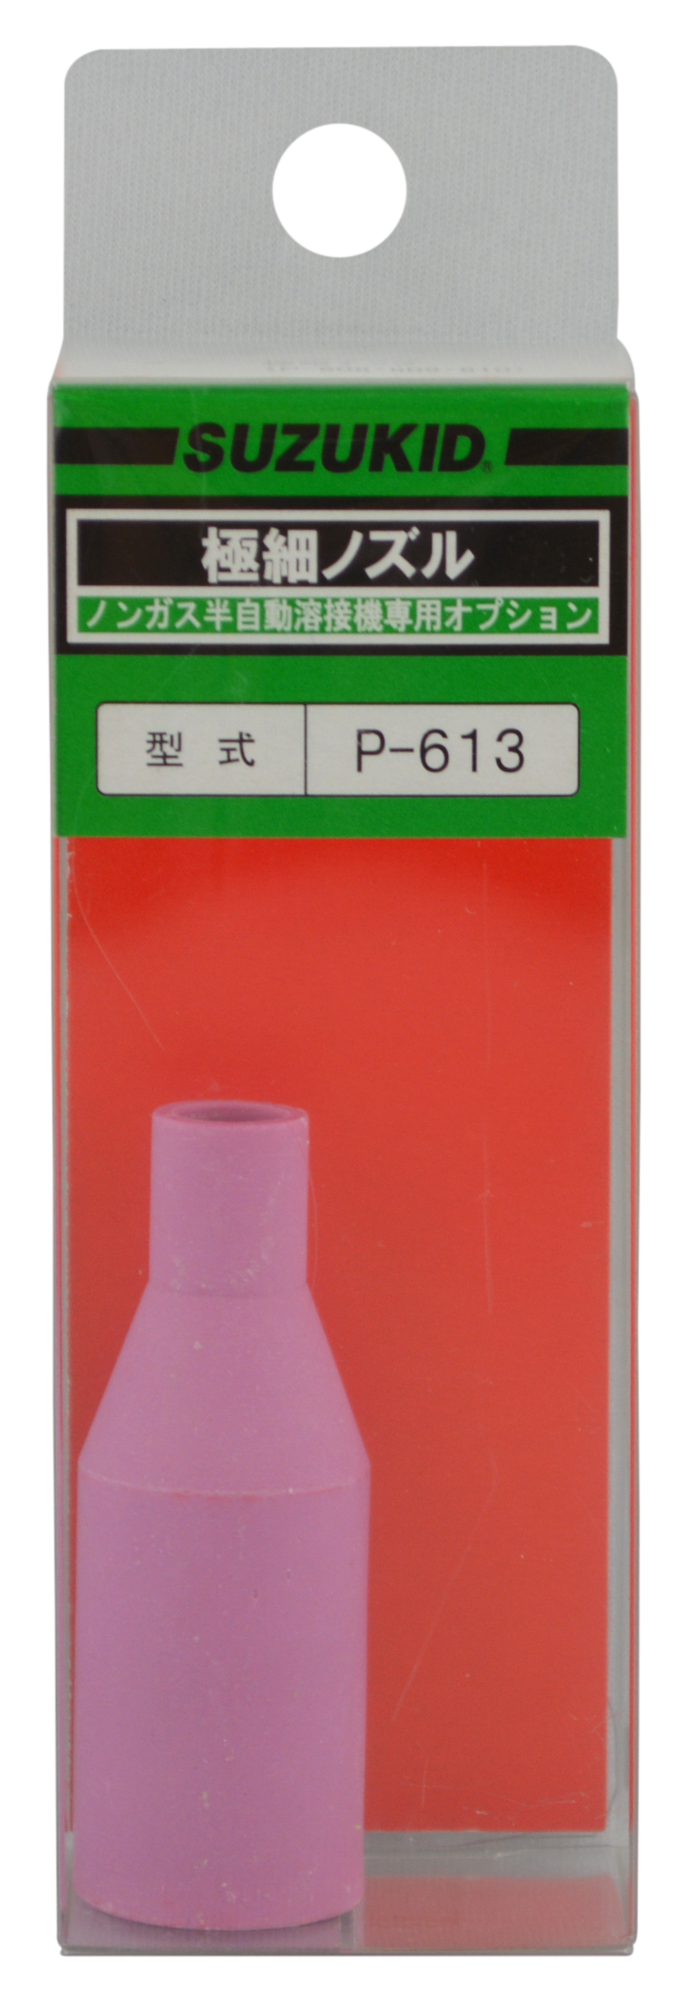 P-613